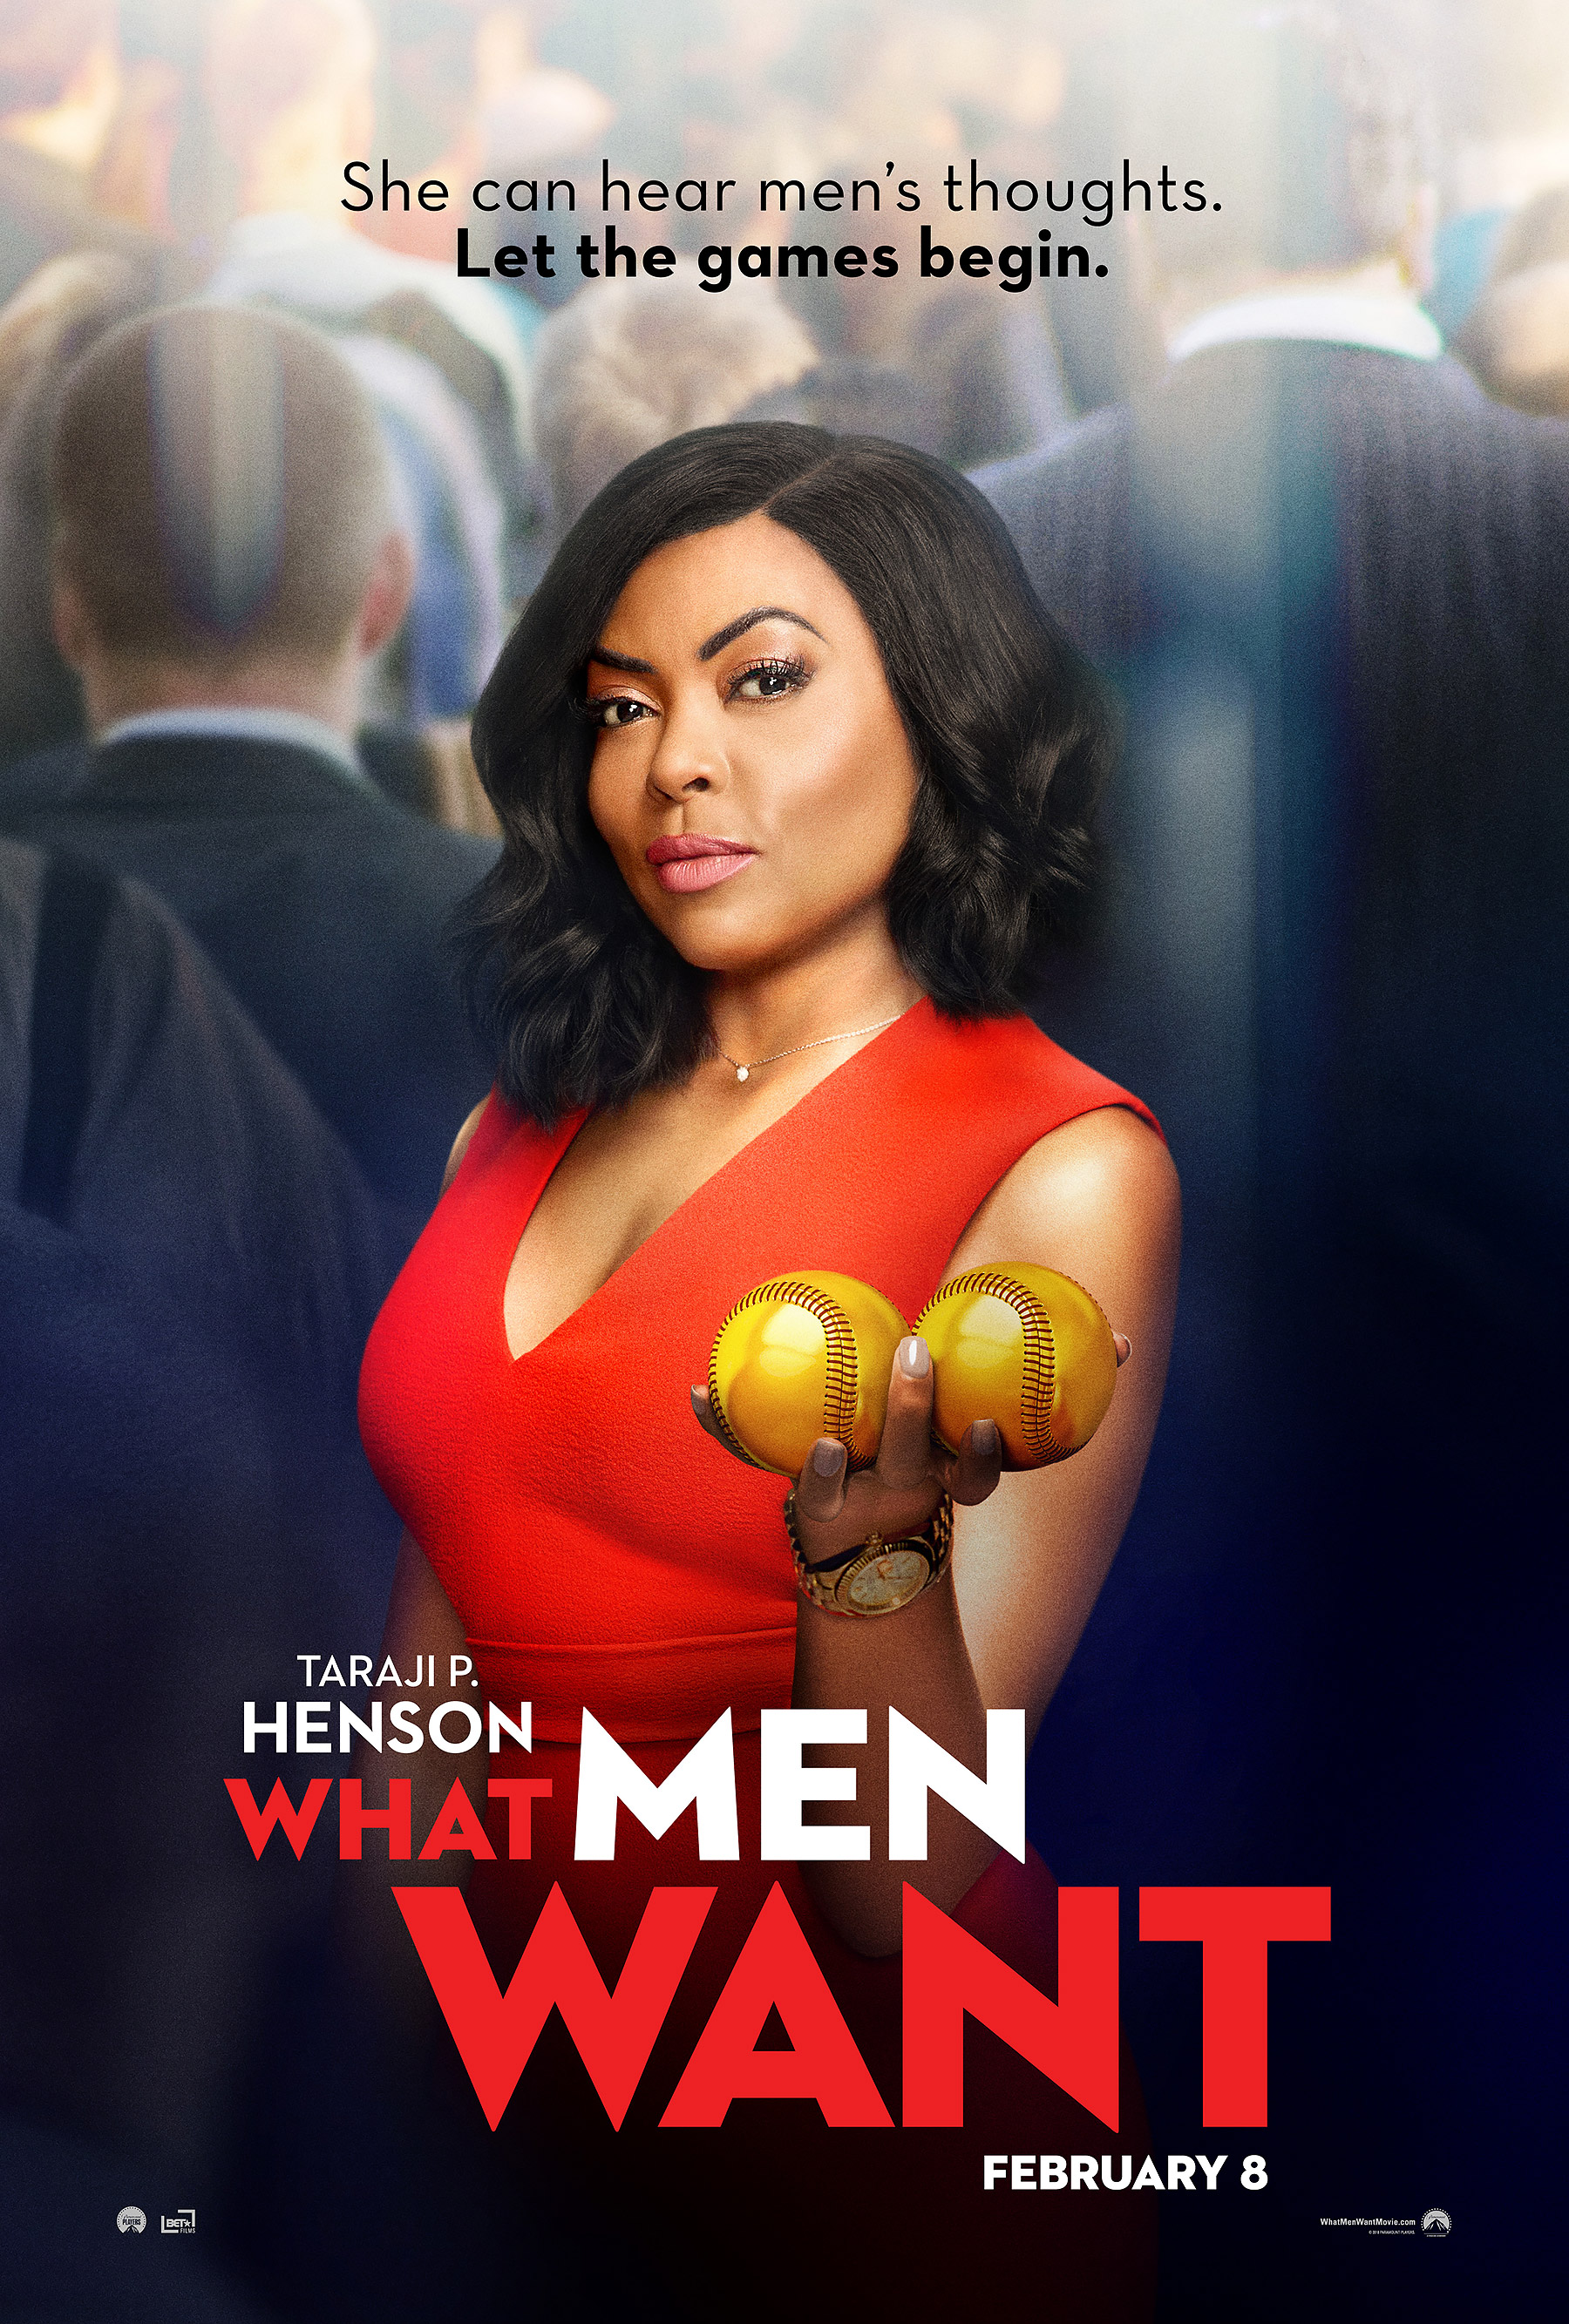 Taraji P. Henson learns <em>What Men Want</em> in NSFW red-band trailer 1